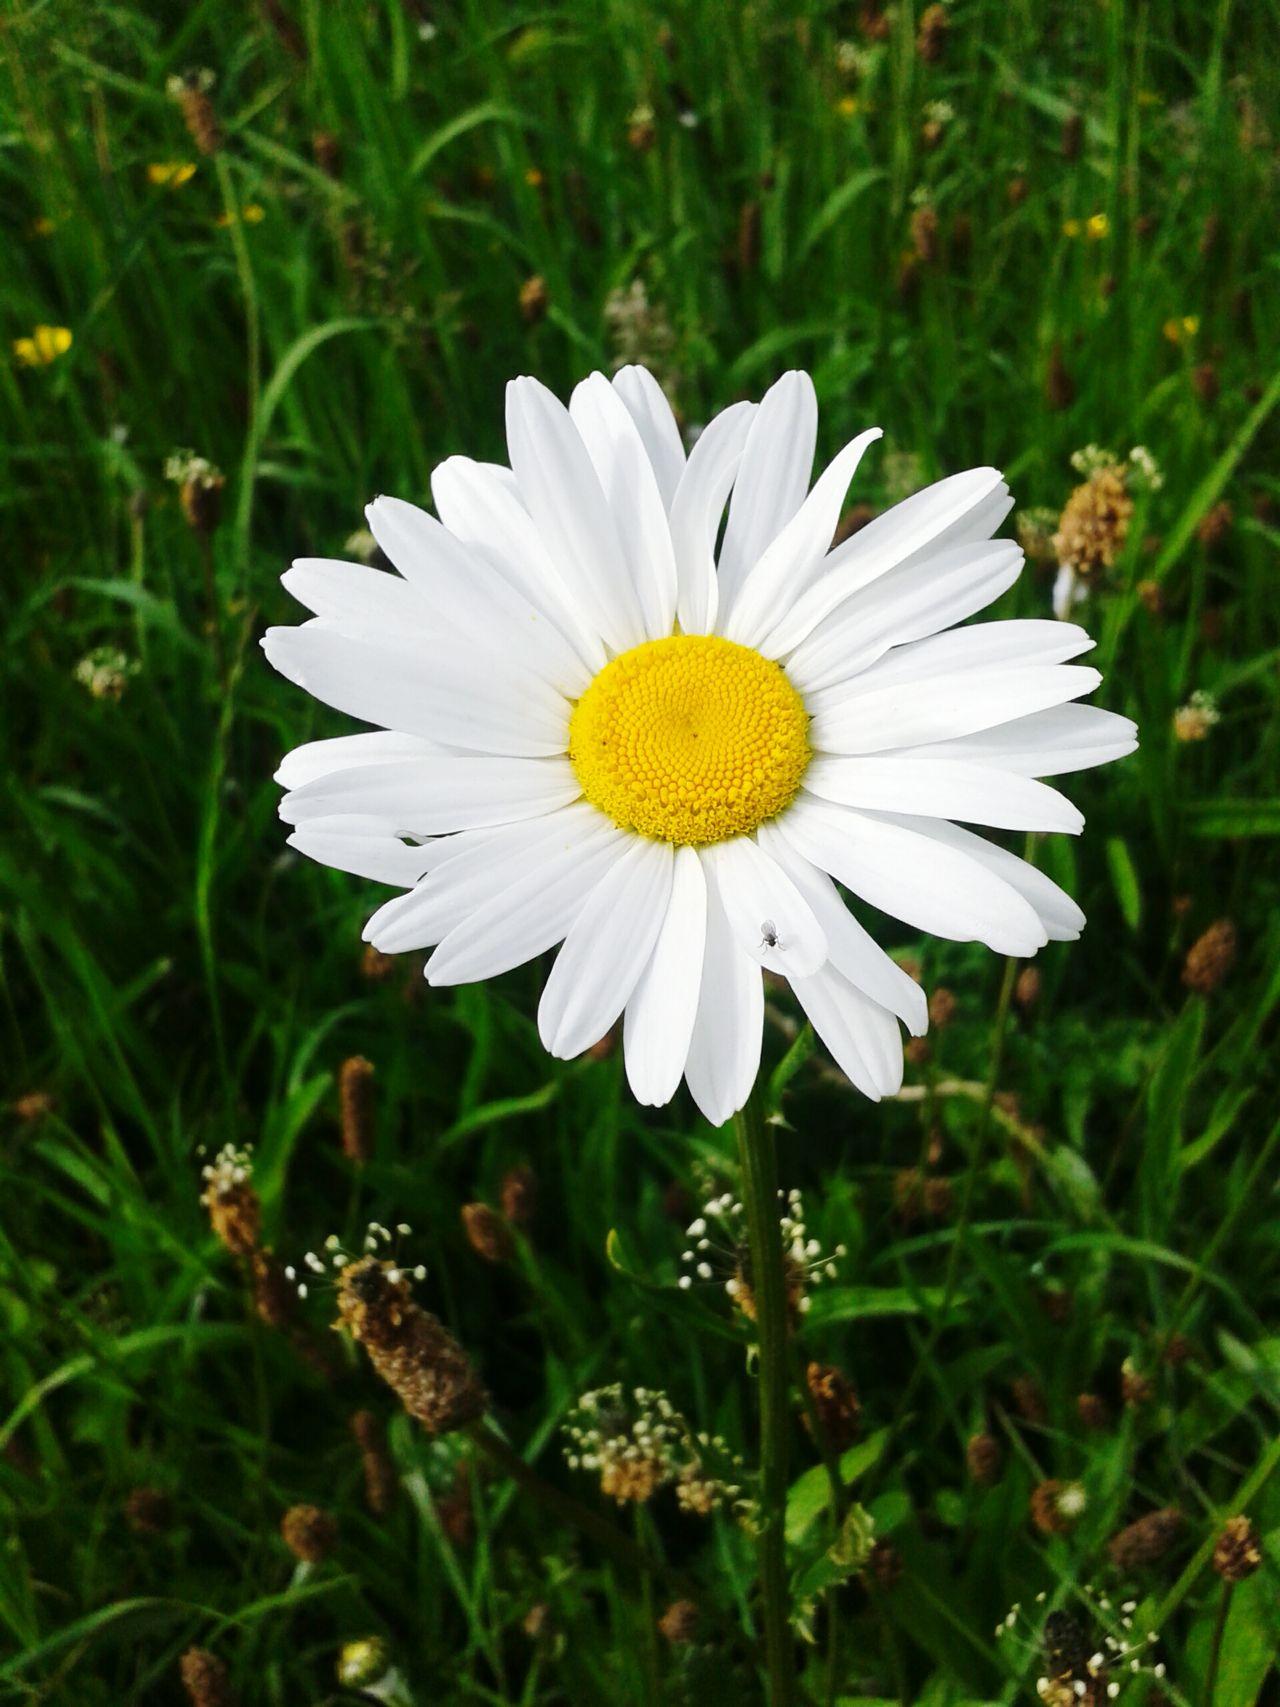 Summertime Flower Photography Taking Photos Sunnyday Flowerpower Lifeisgood Itsallgood Daisy Lonelydaisy